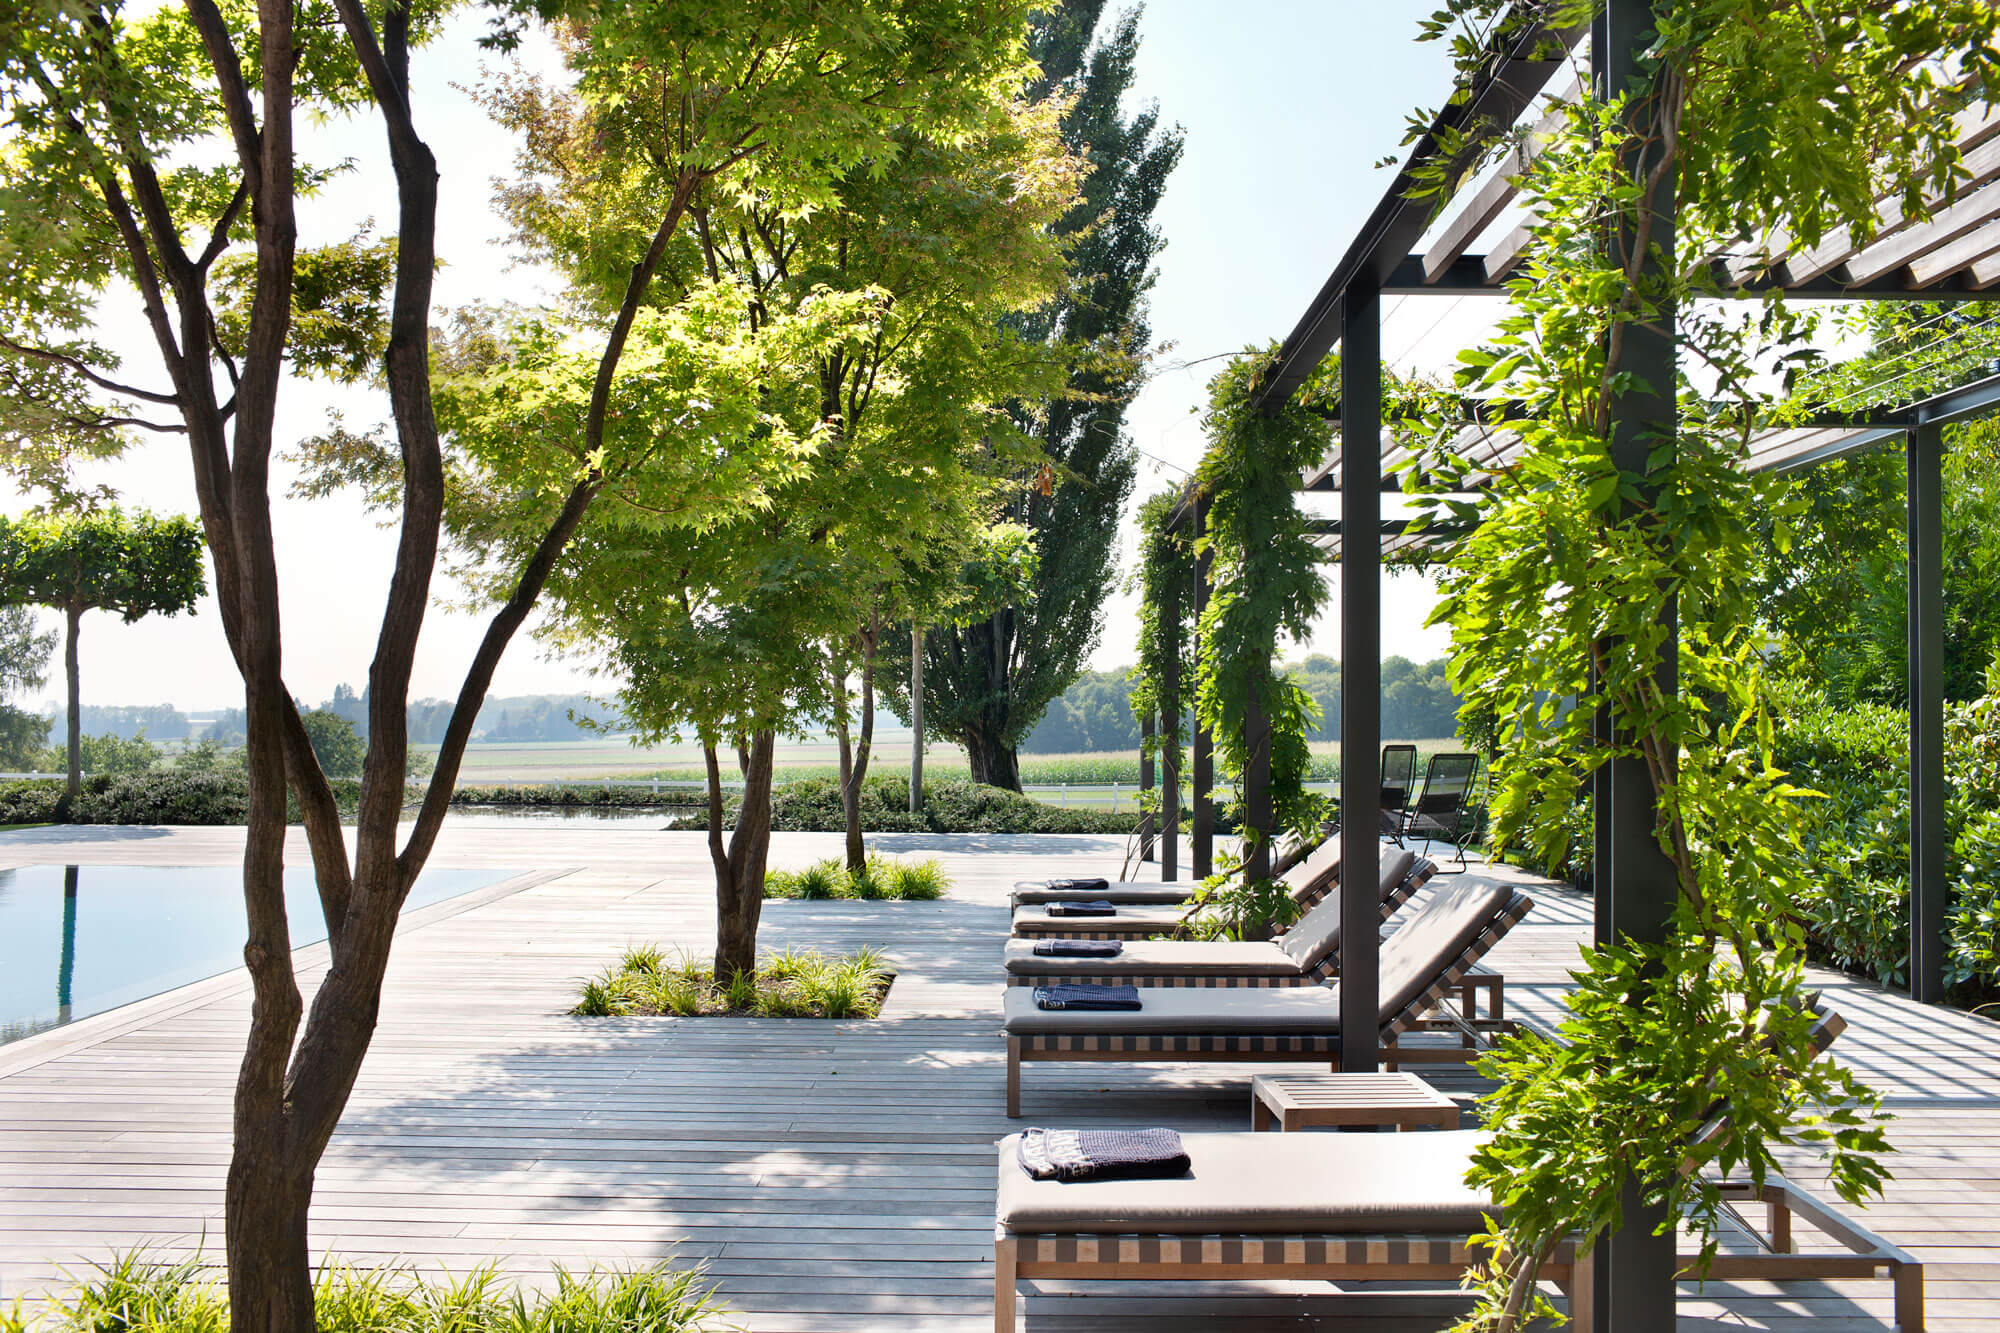 Enea Landscape Architecture Enea Pergolas Enea Landscape Architecture